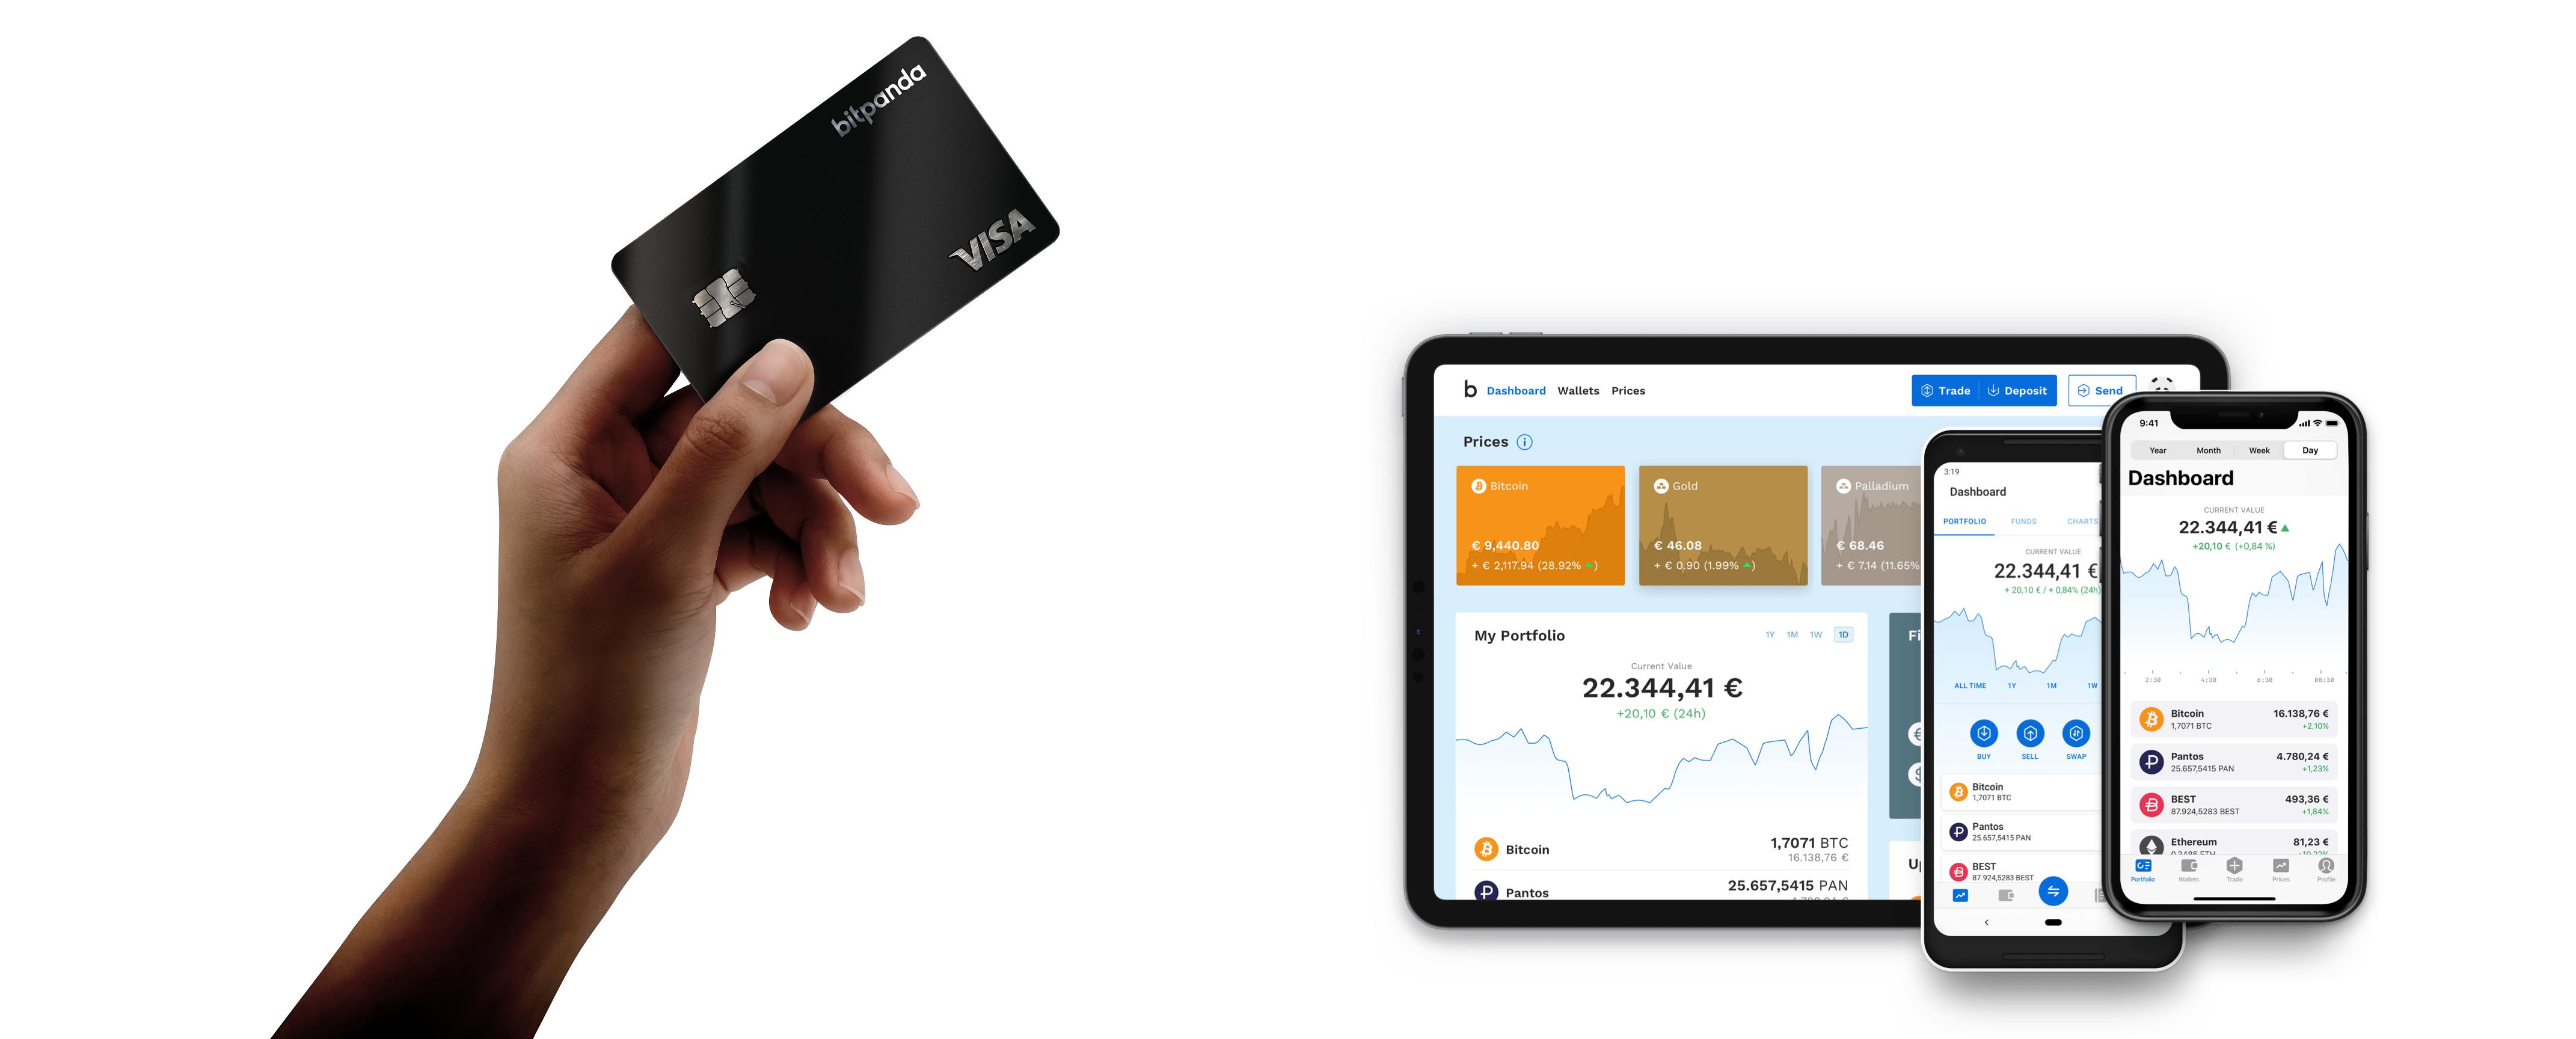 Kryptovaluuttapörssi Bitpanda avaa Visa-maksukortin ennakkotilaukset